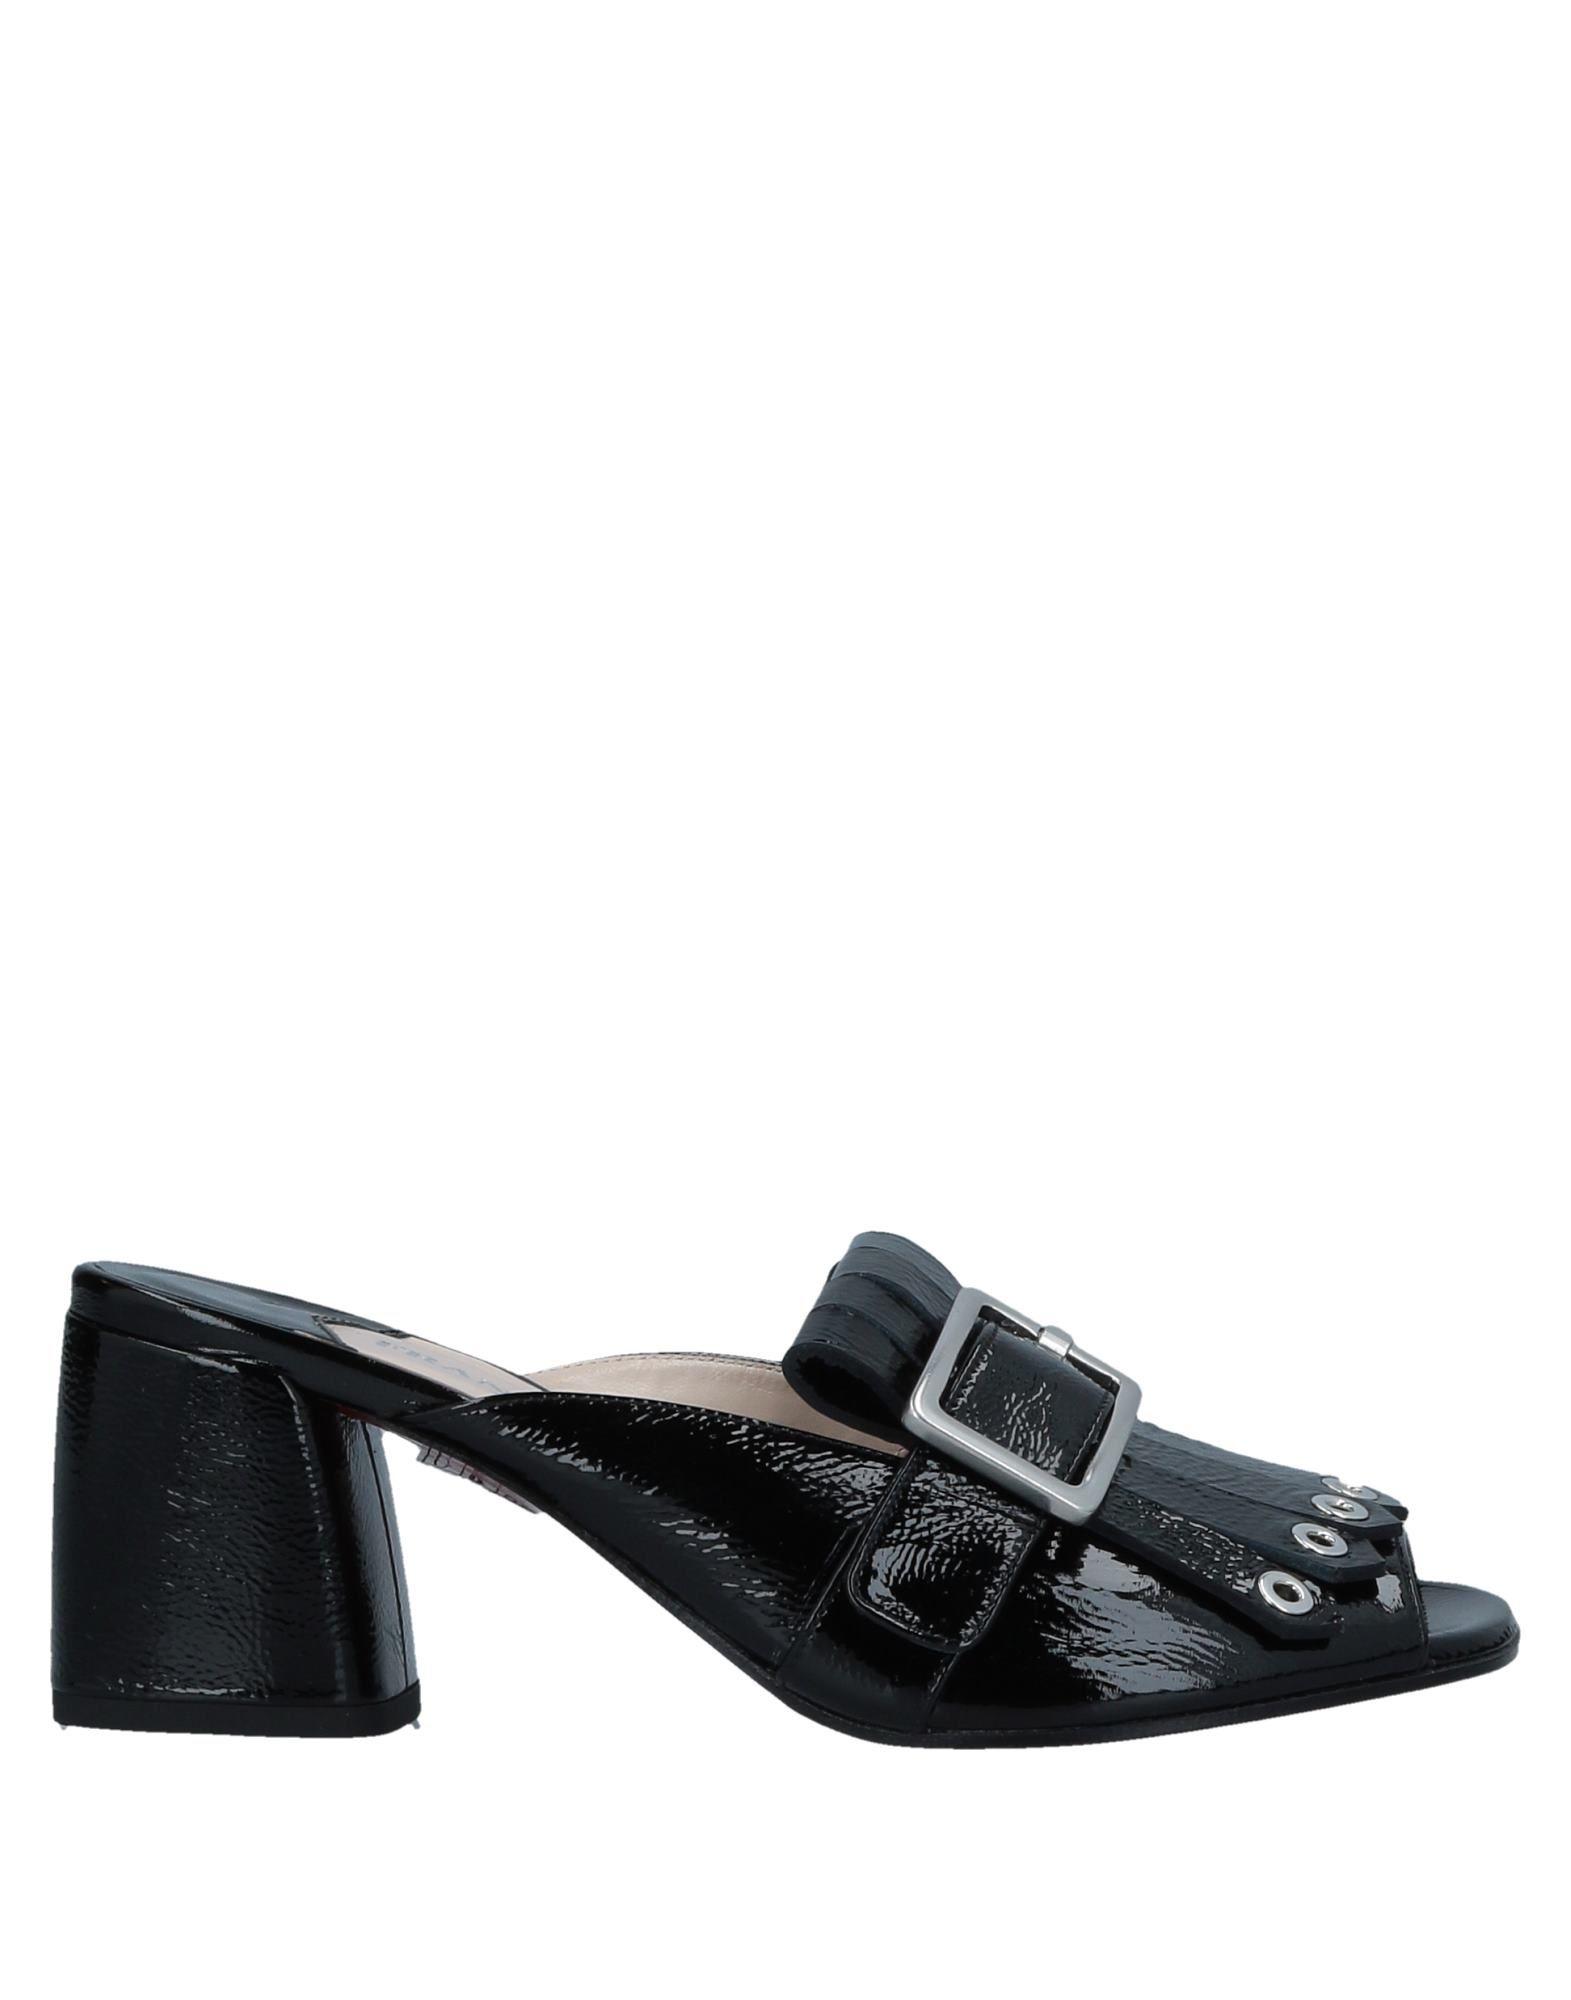 FRANCO COLLI Sandals in Black